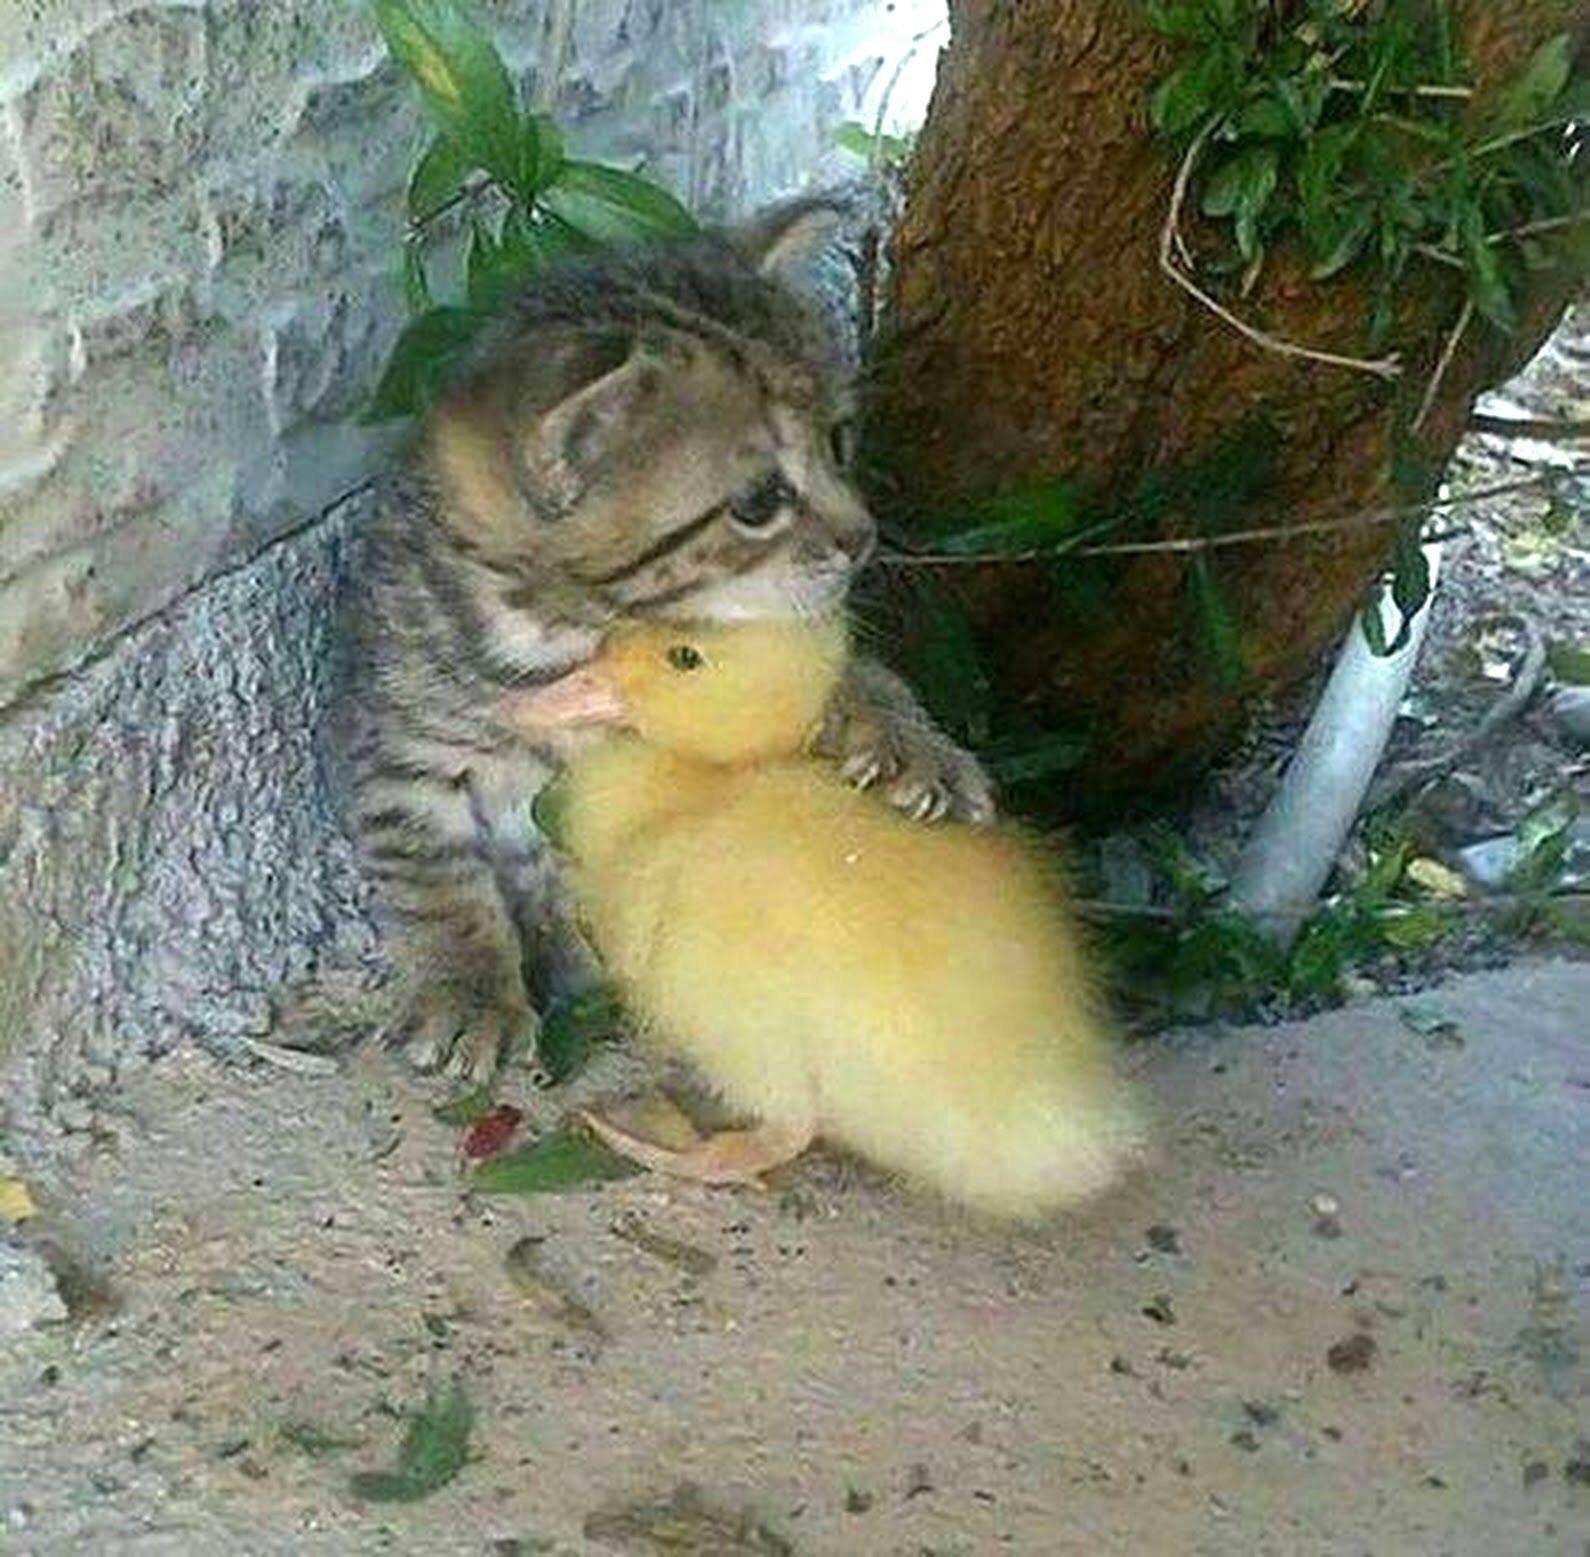 Duck And Kitty Bonding Https Ift Tt 2ucudss Cute Puppies Cats Animals Cute Baby Animals Cute Animals Animals Friendship